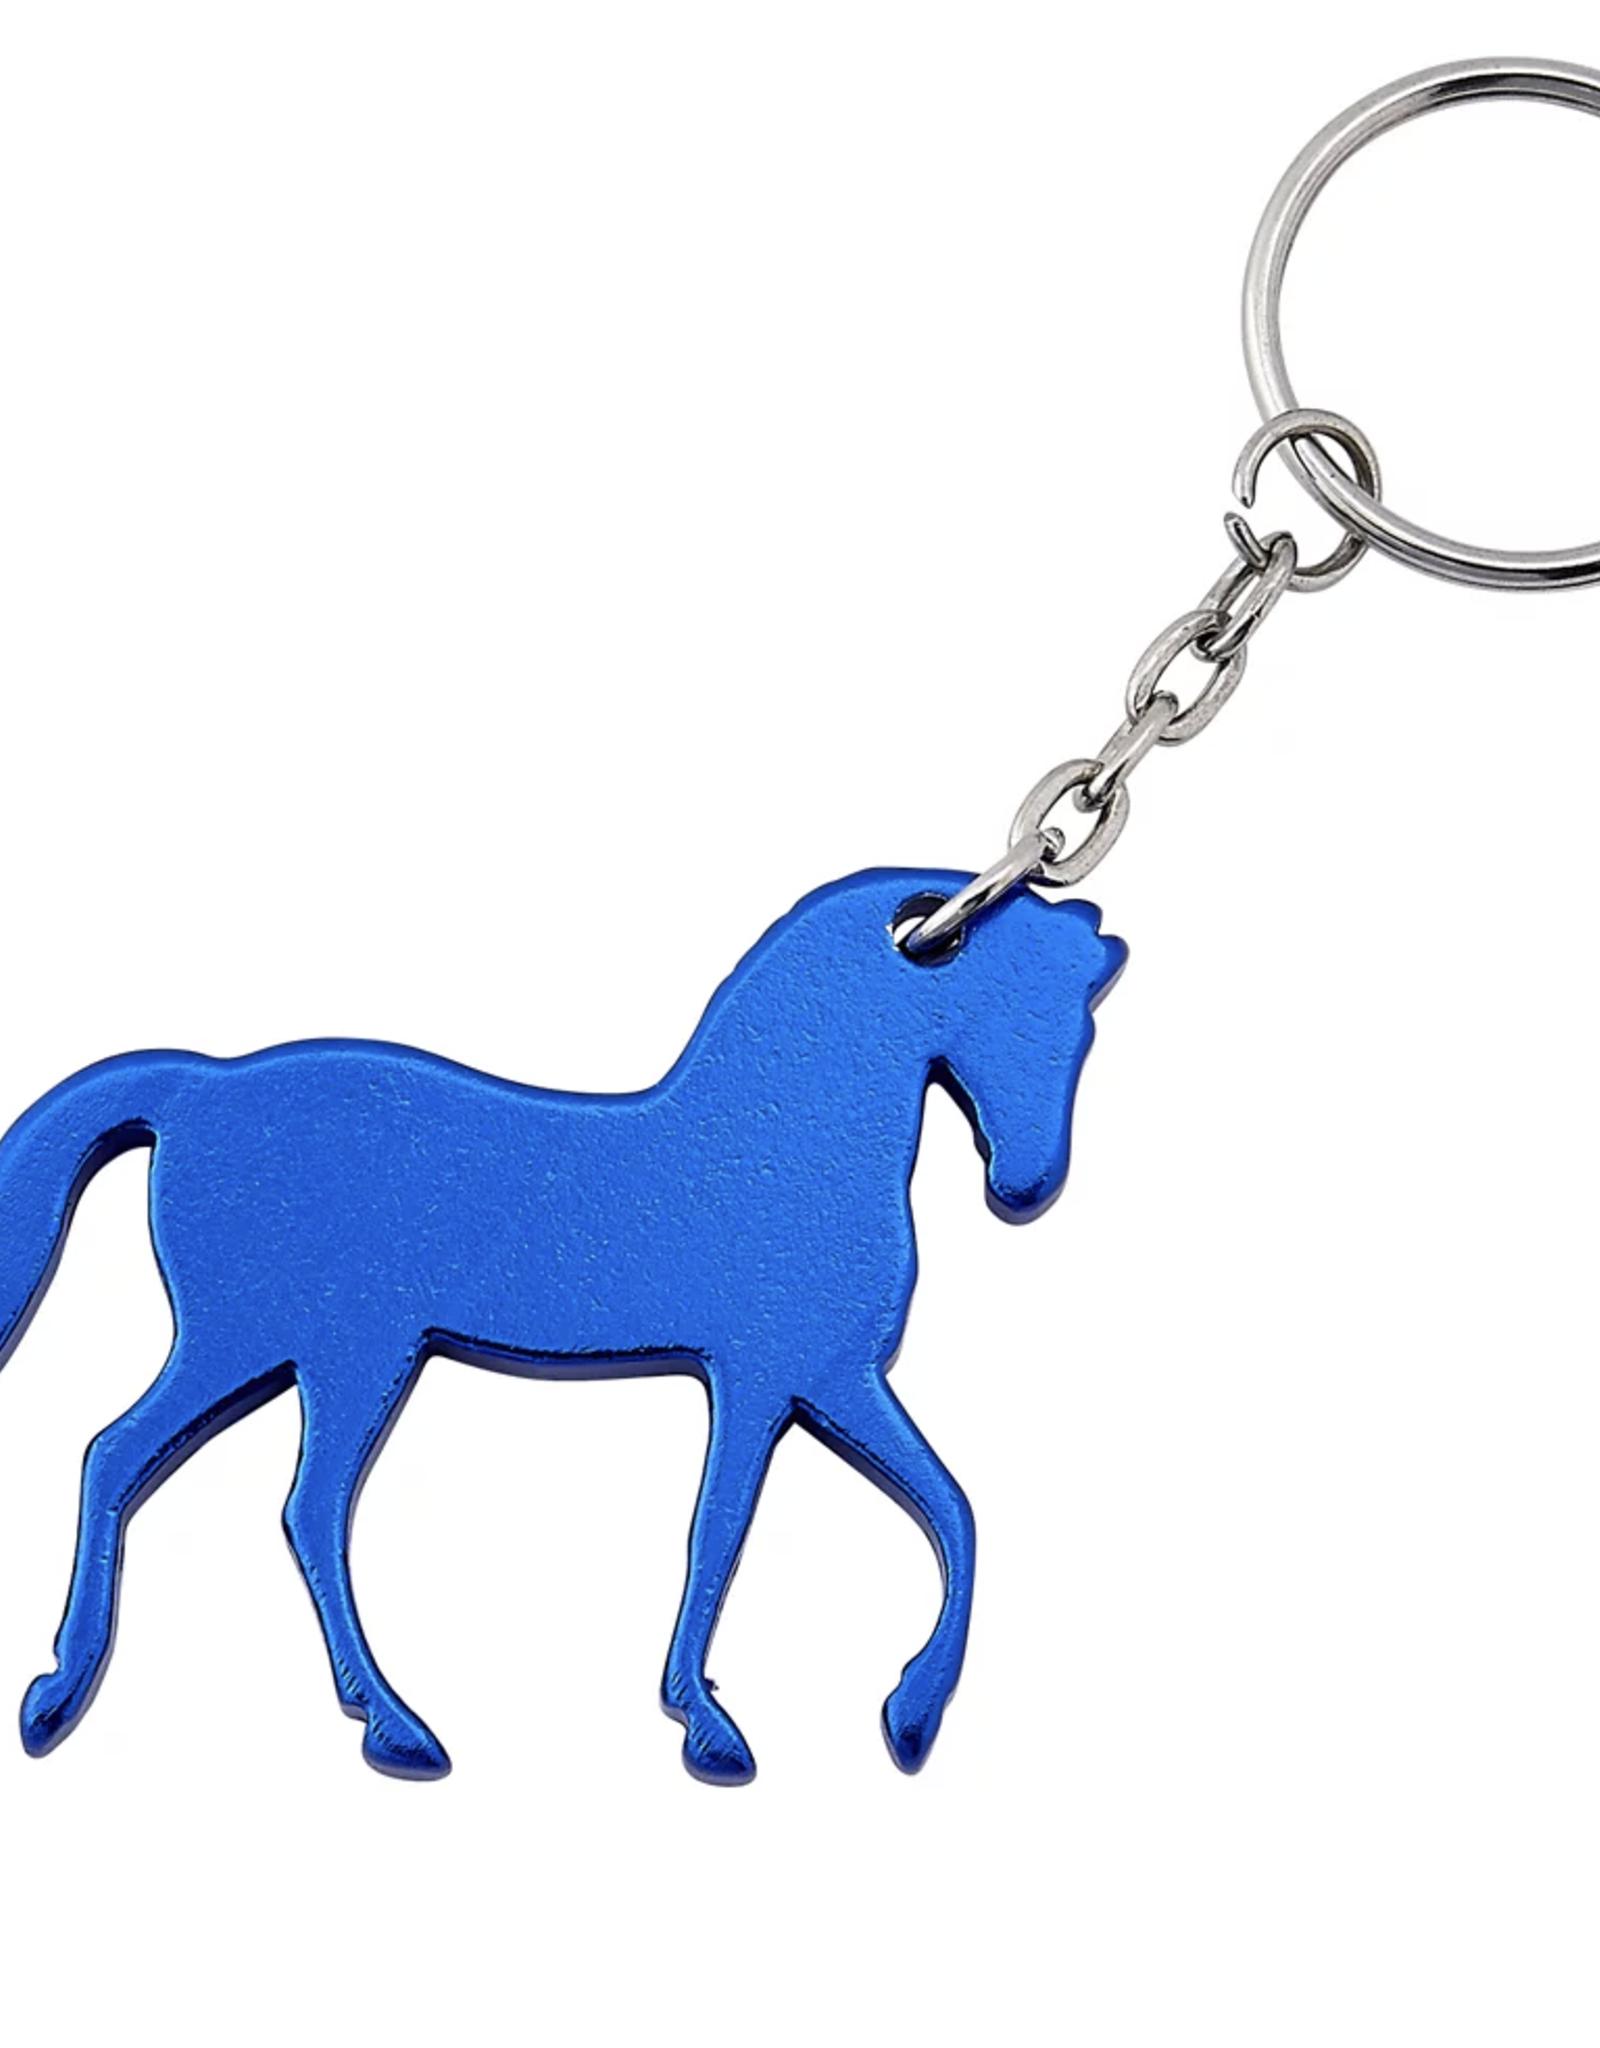 AWST Awst Prancing Horse Key Chain